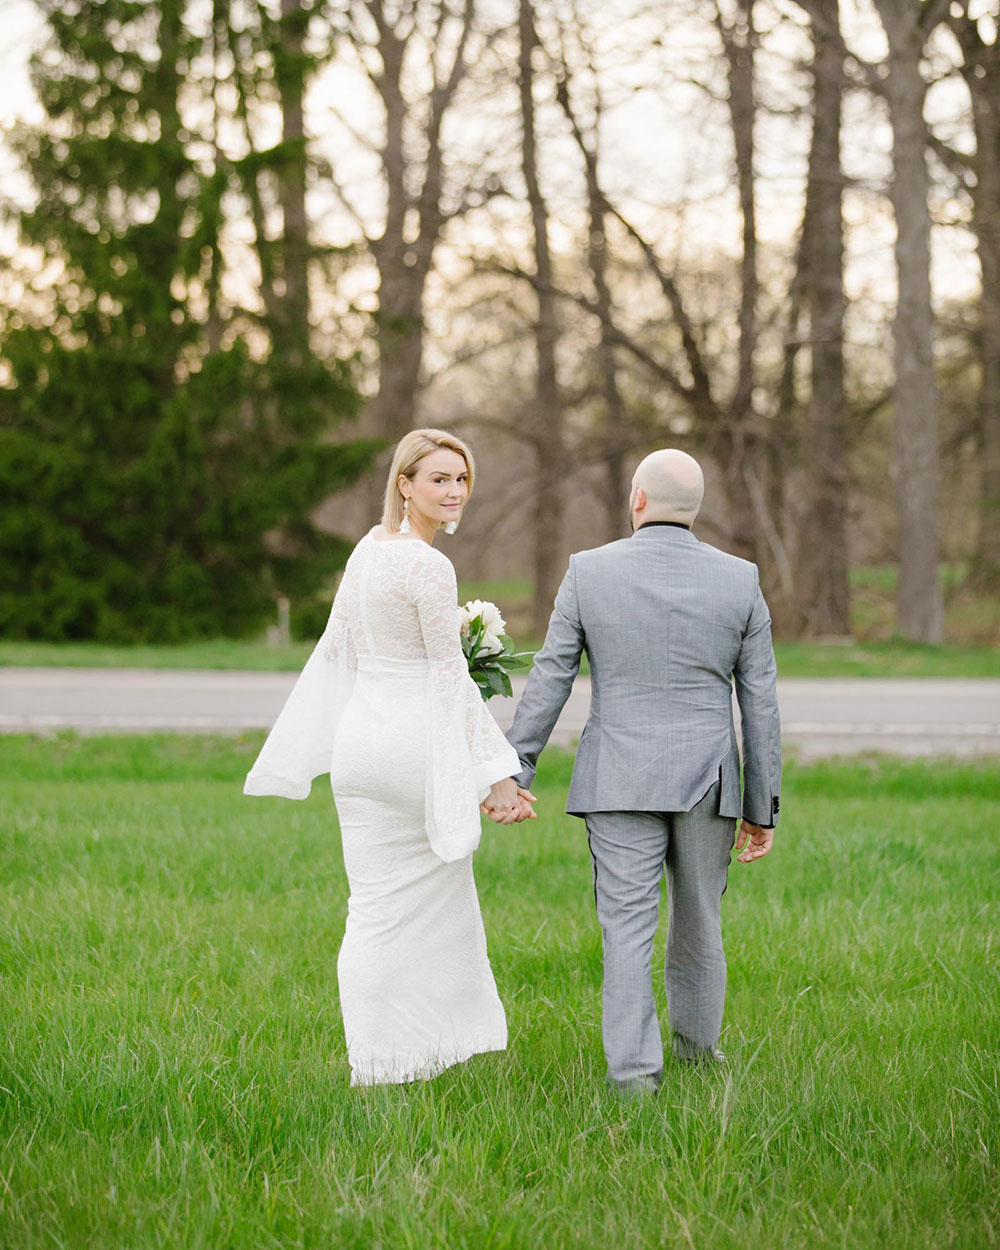 oast-house-wedding-niagara-on-the-lake-pop-up-weddings-photo-by-nataschia-wielink-photography-0023.JPG